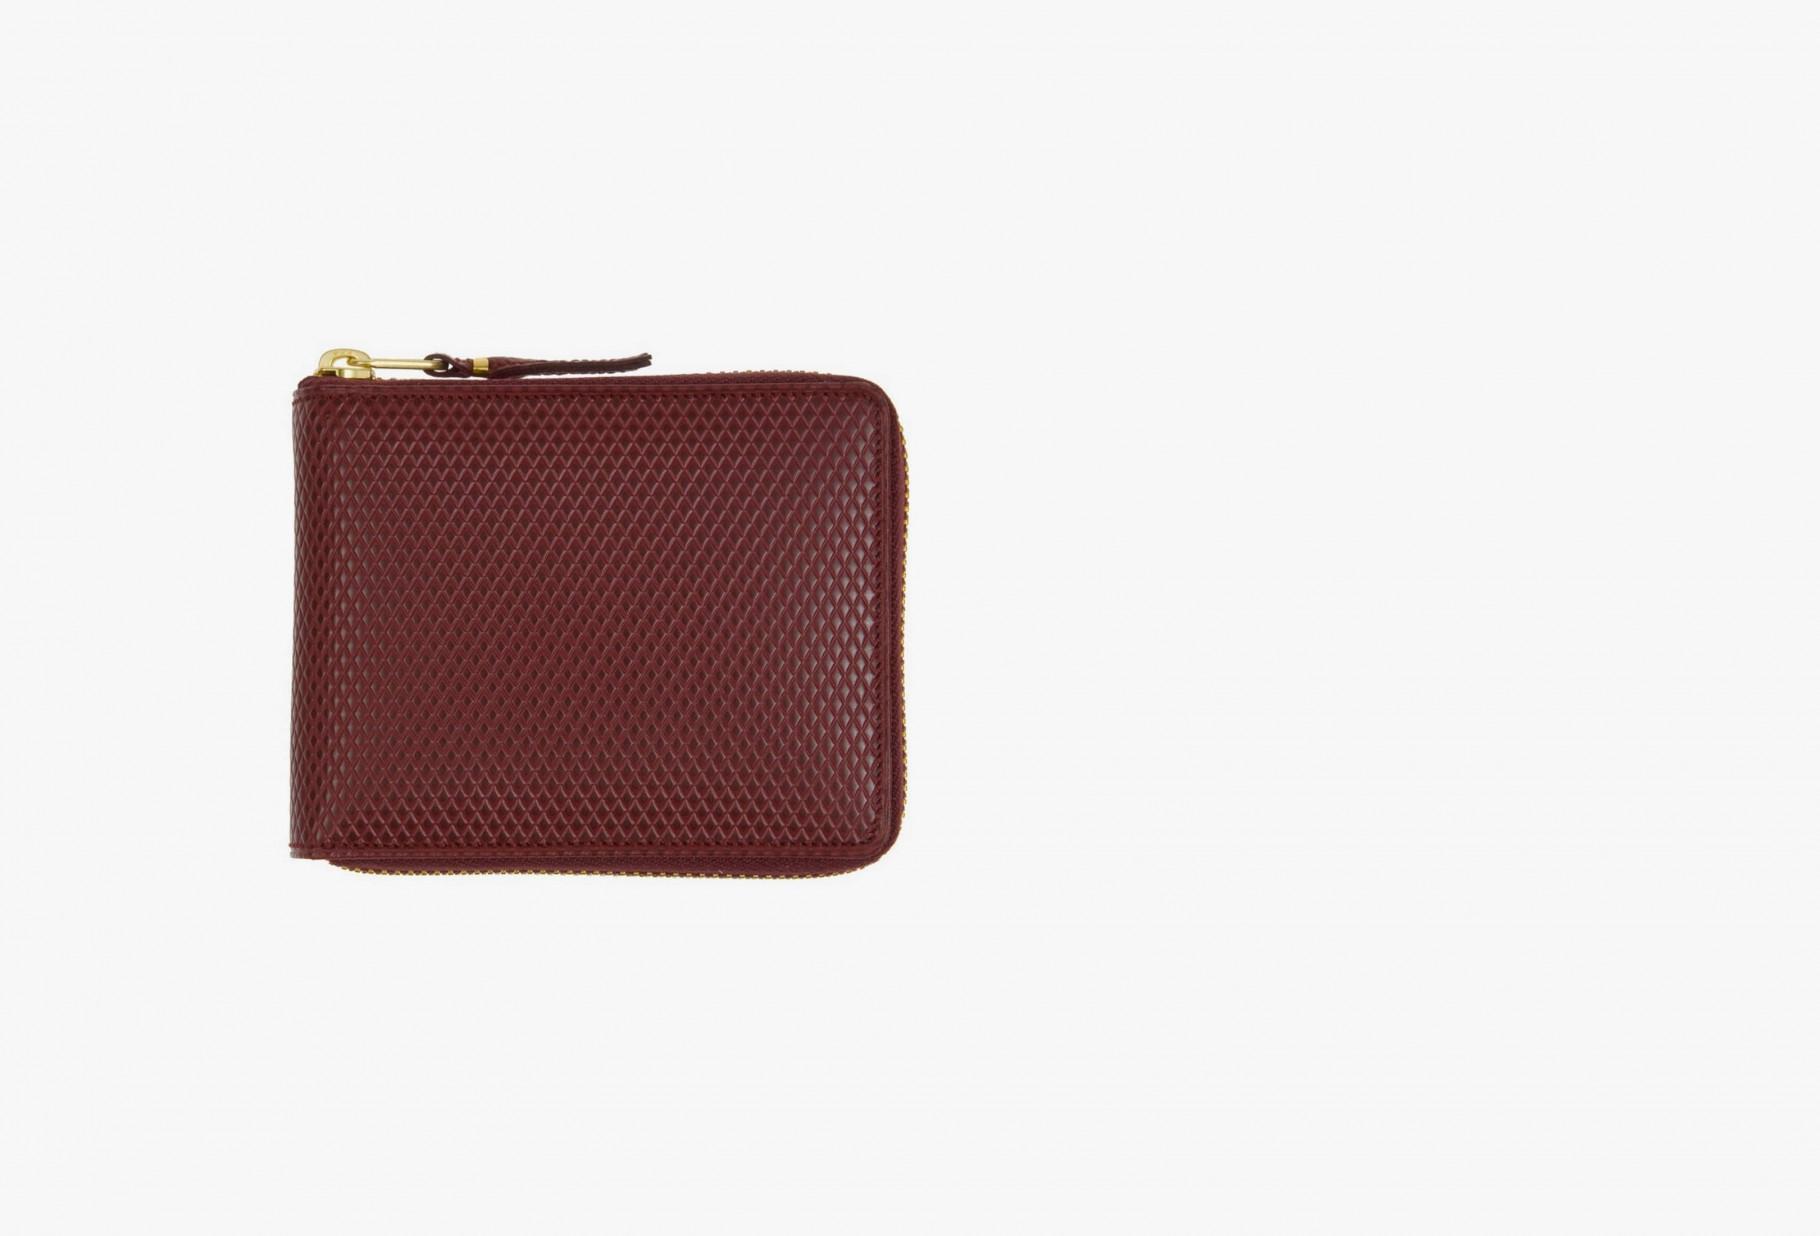 COMME DES GARÇONS WALLETS / Cdg luxury group sa7100lg Burgundy